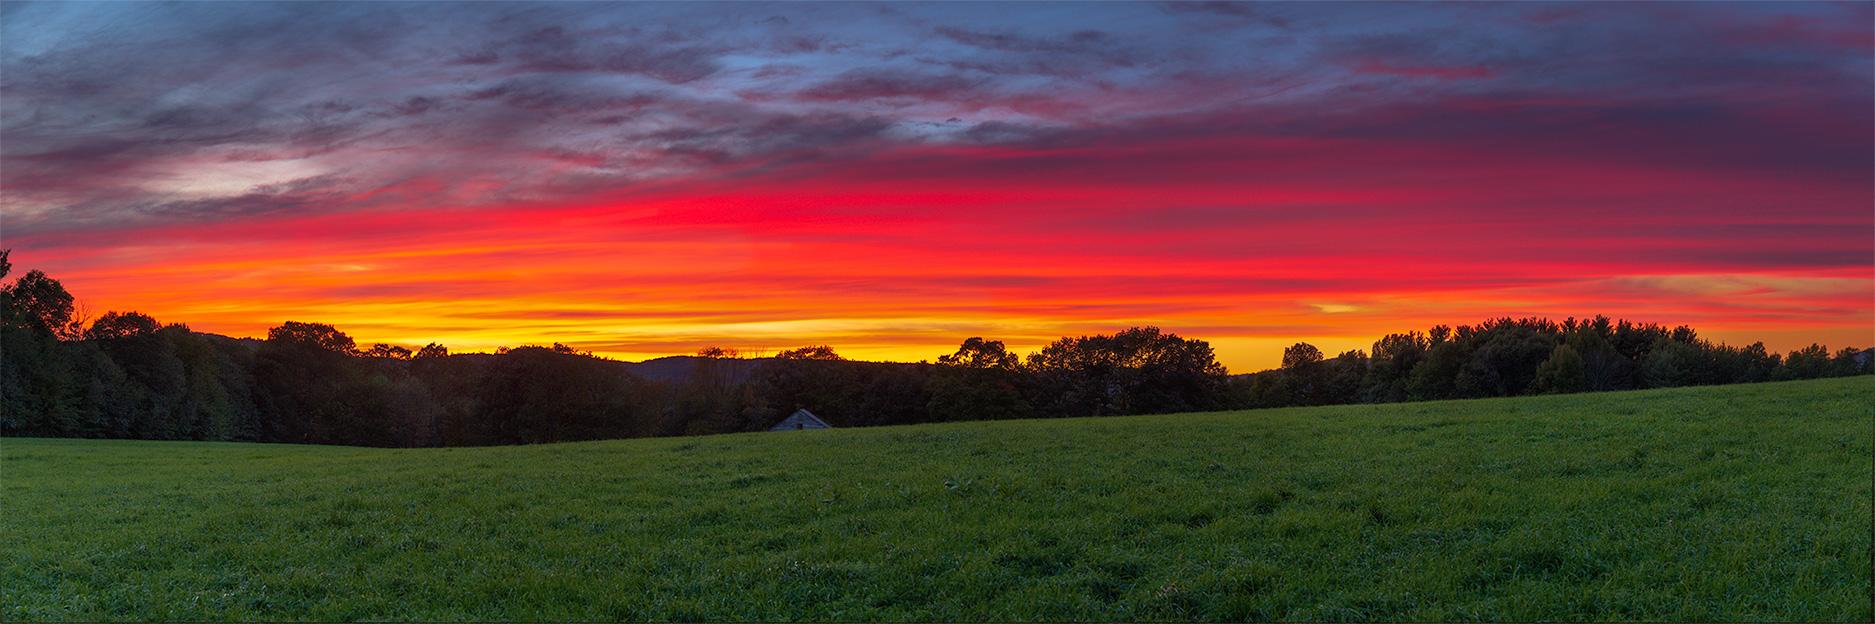 2018.09.22_0175797 Cottage Hill Farm Sunset